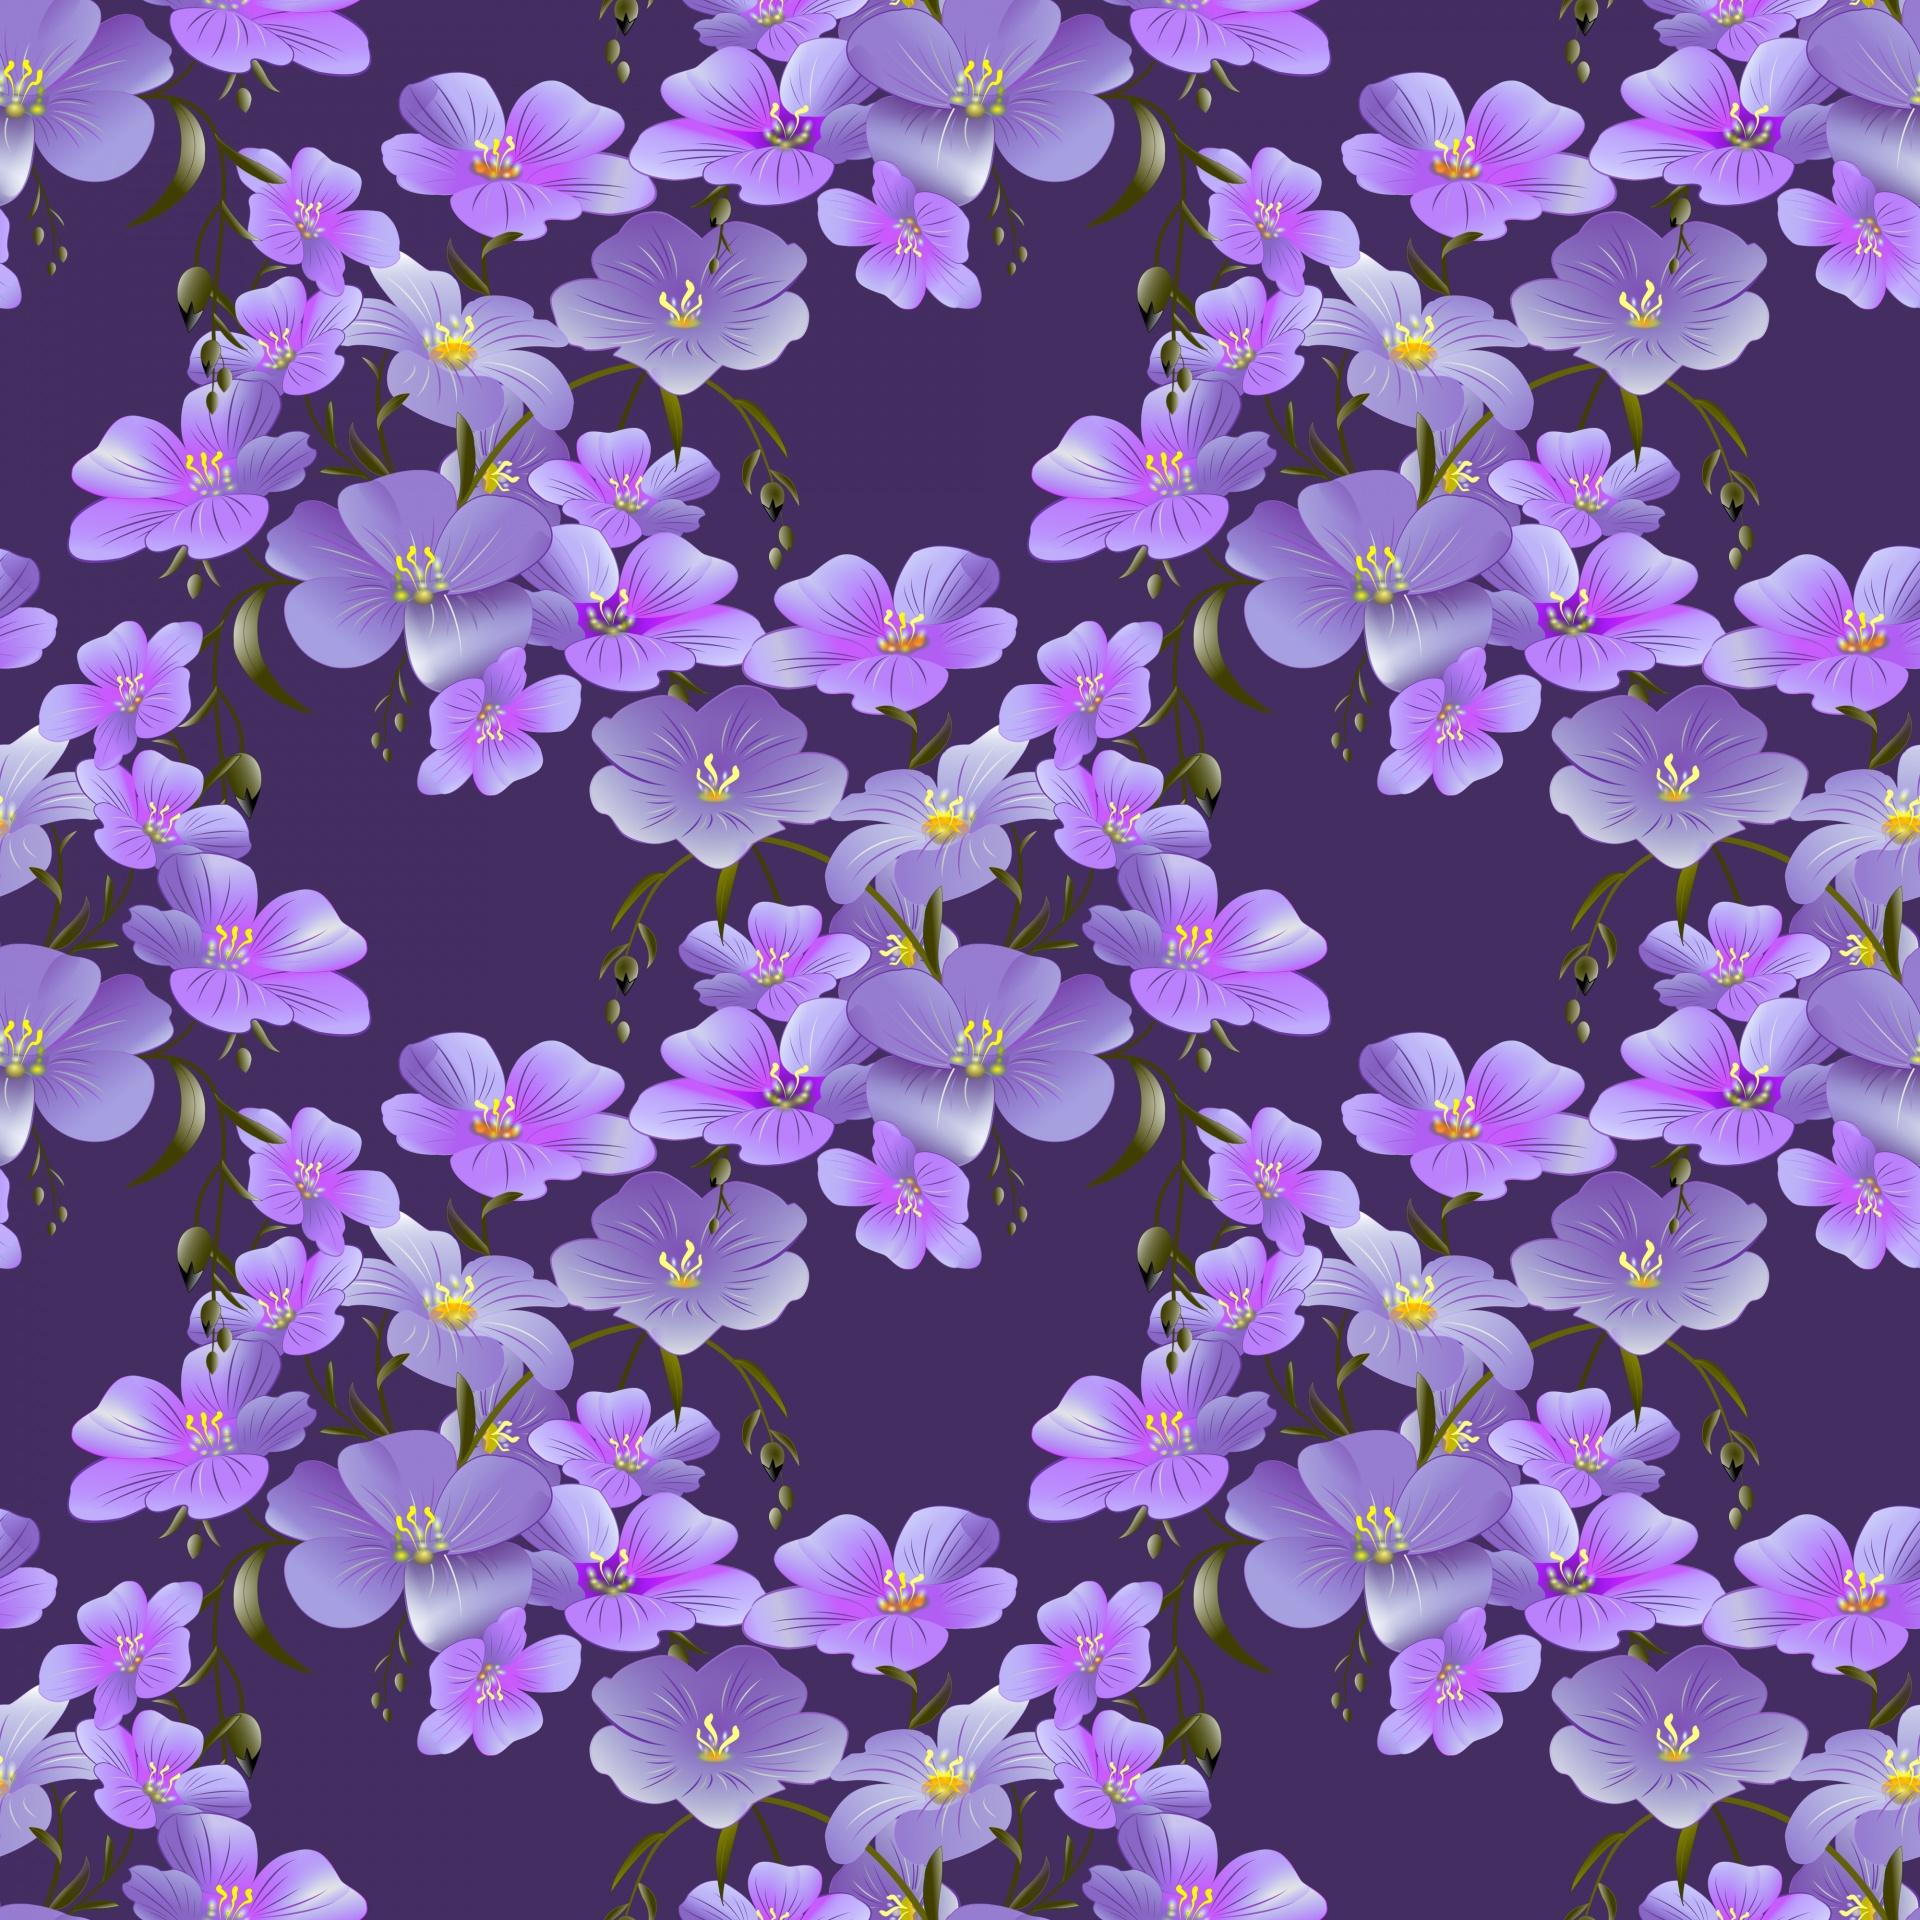 Flowersfloralbackgroundwallpaperpaper free photo from needpix flowersfloralbackgroundwallpaperpaperpatternseamlessbackdrop mightylinksfo